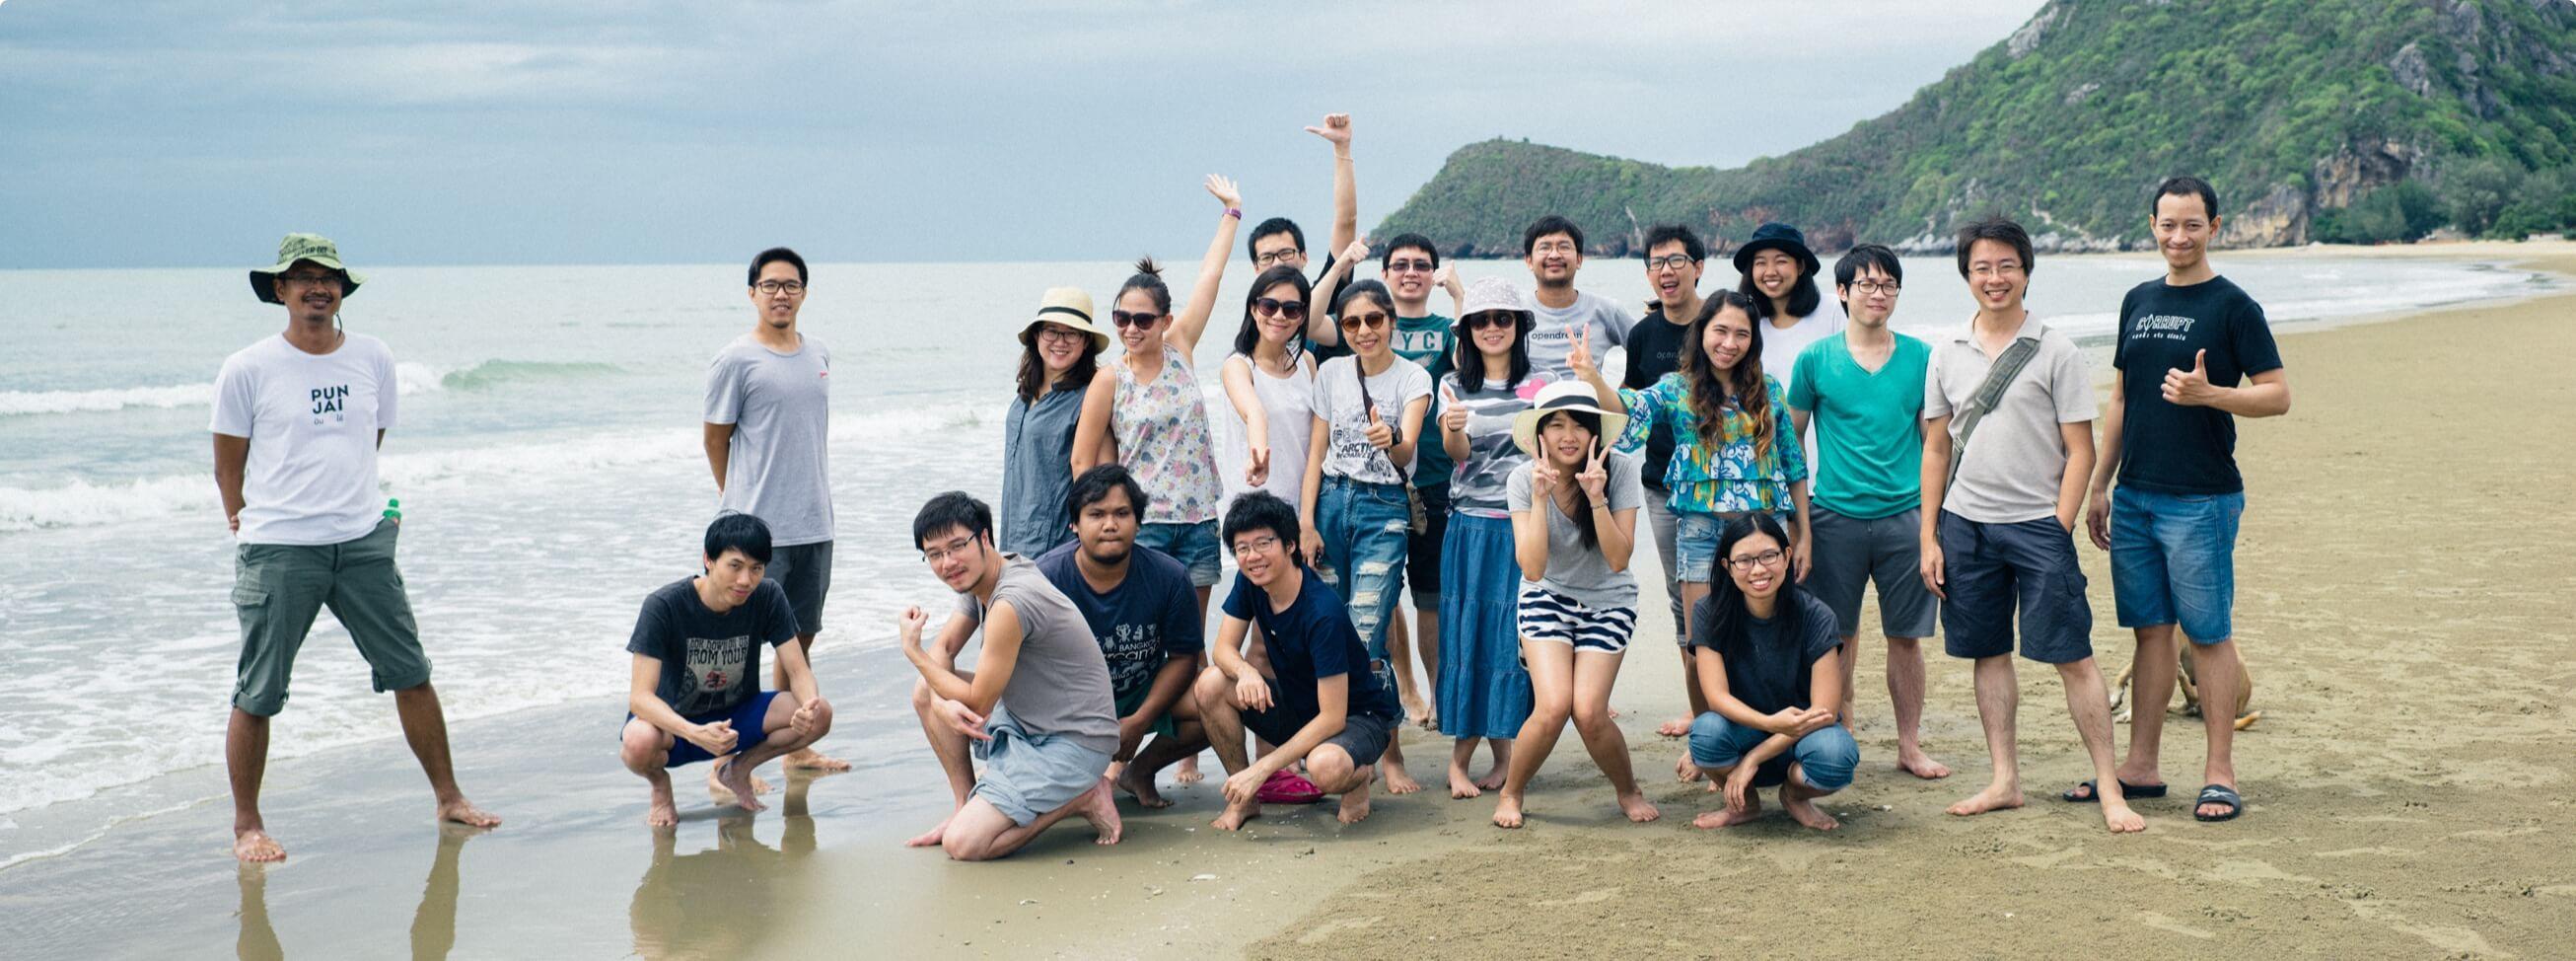 Image team@2x